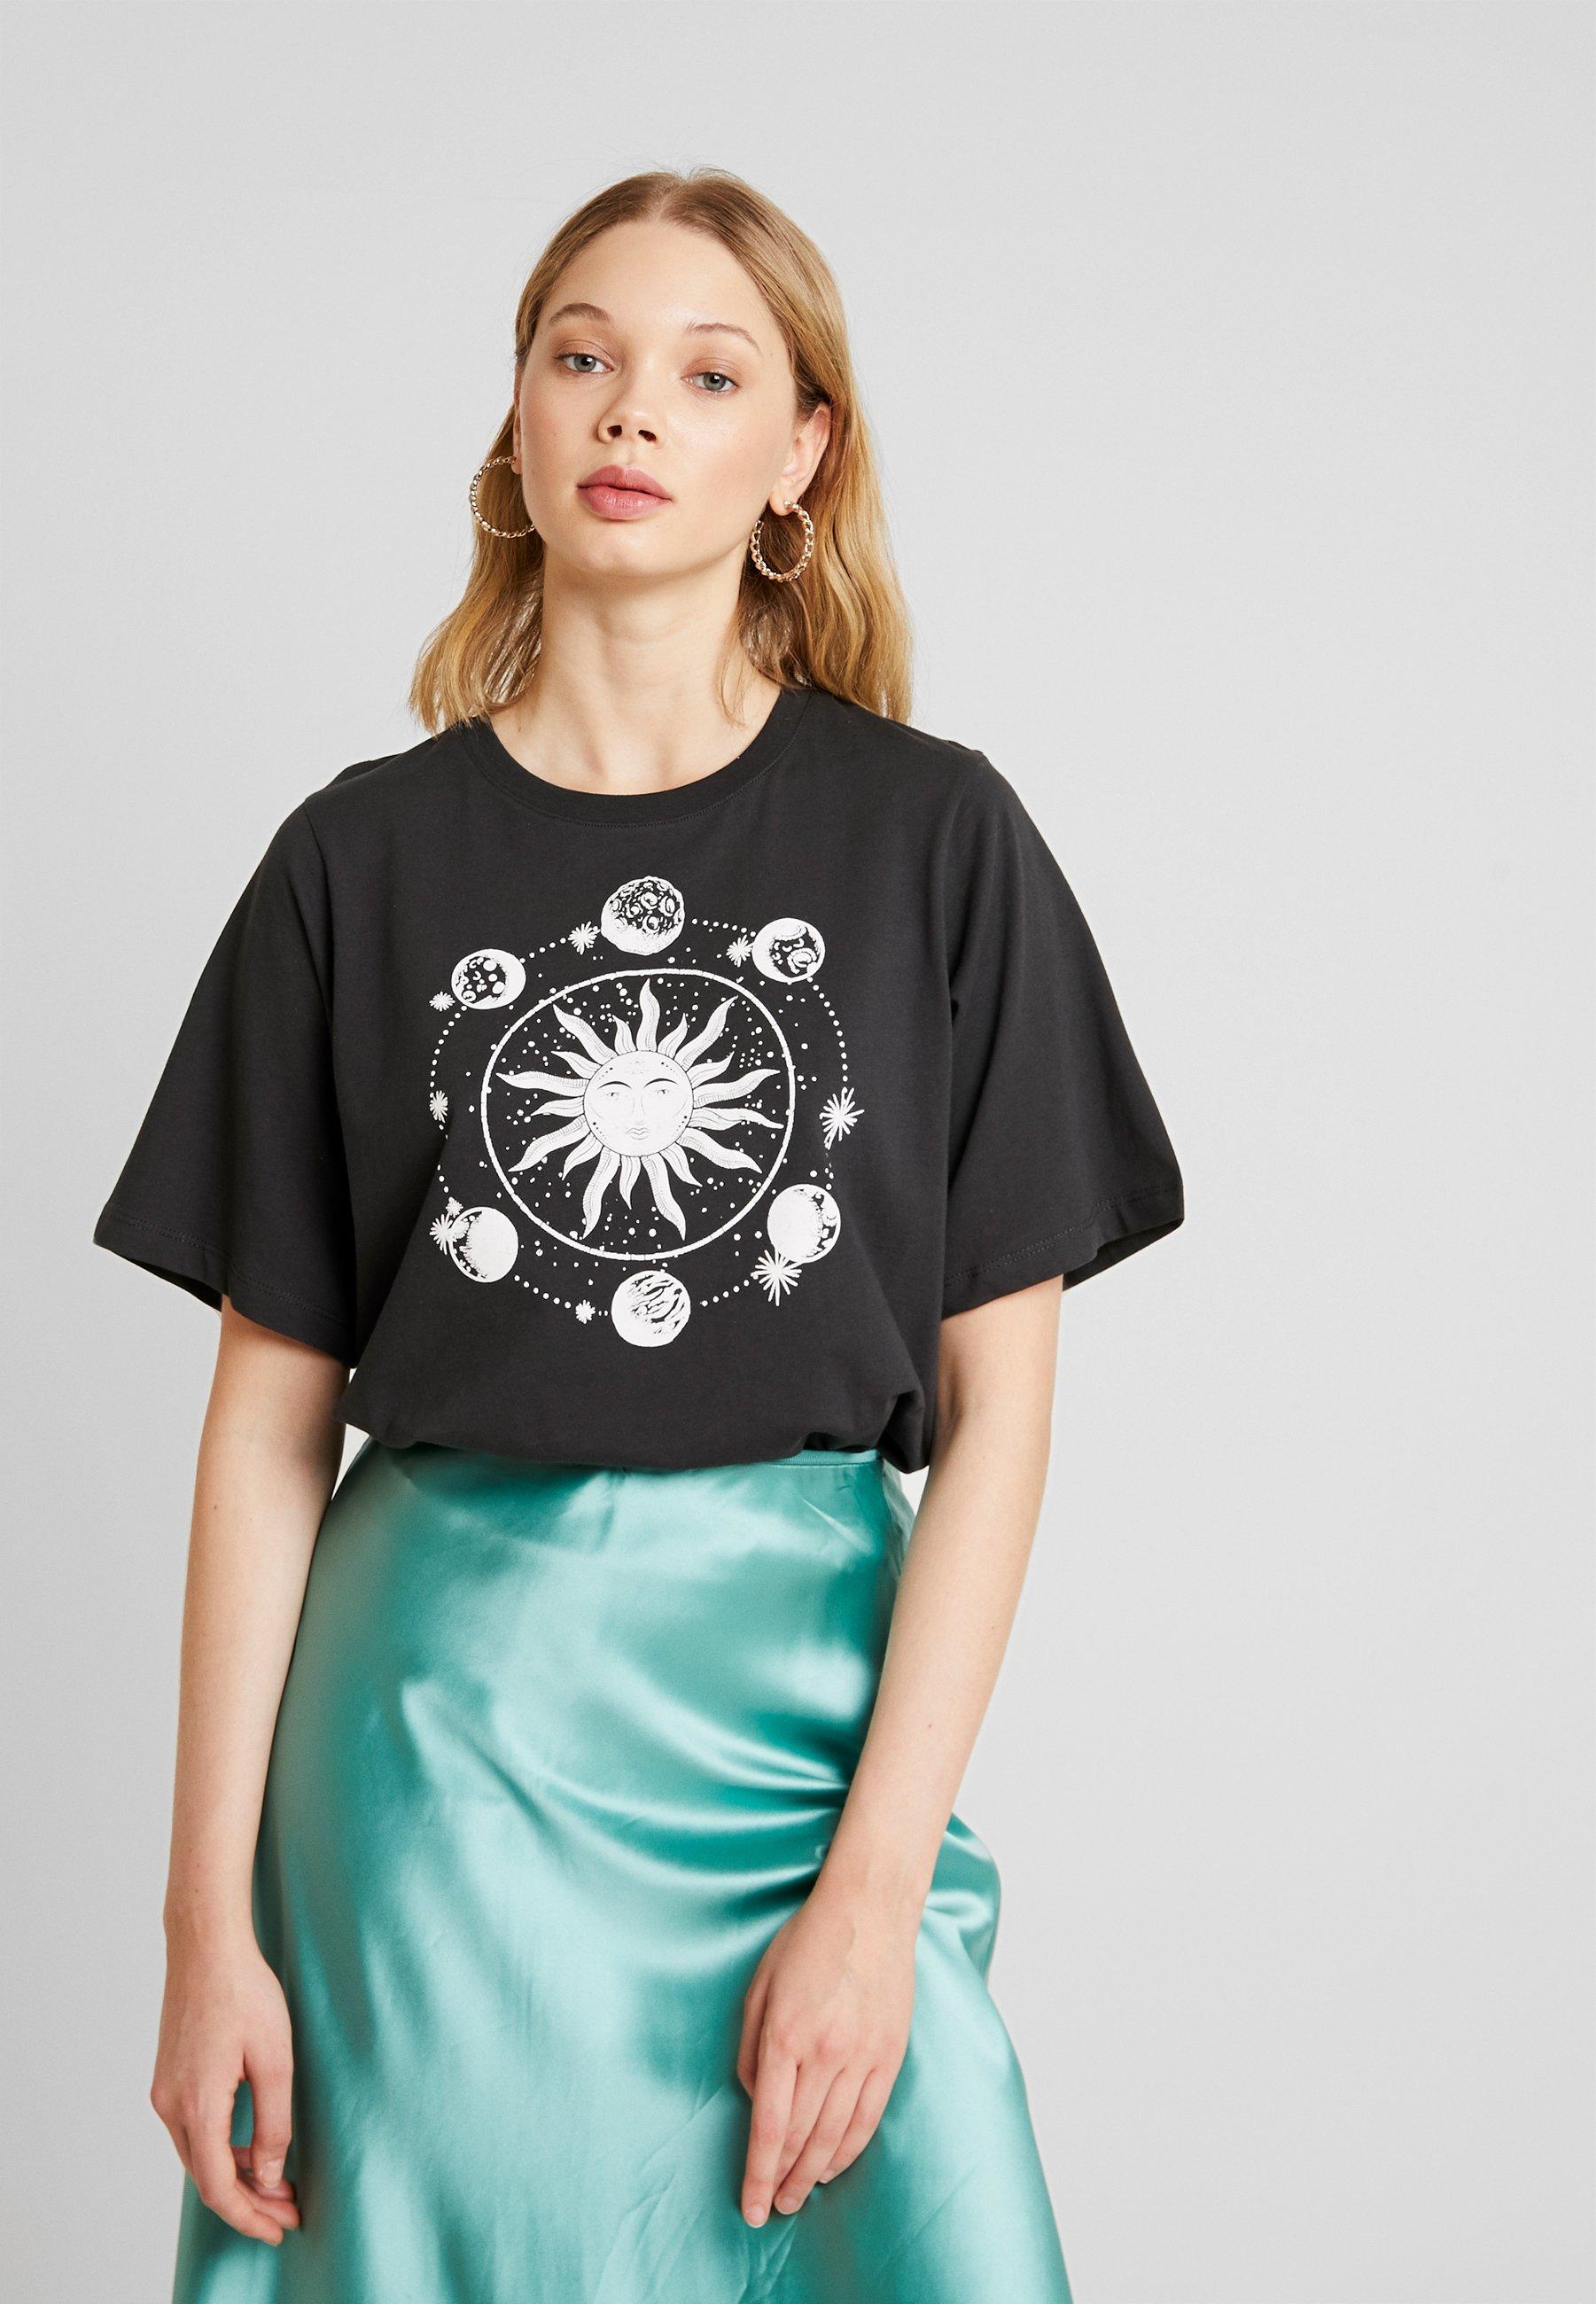 imprimé Even T shirt amp;Odd anthracite uF3JK15Tlc